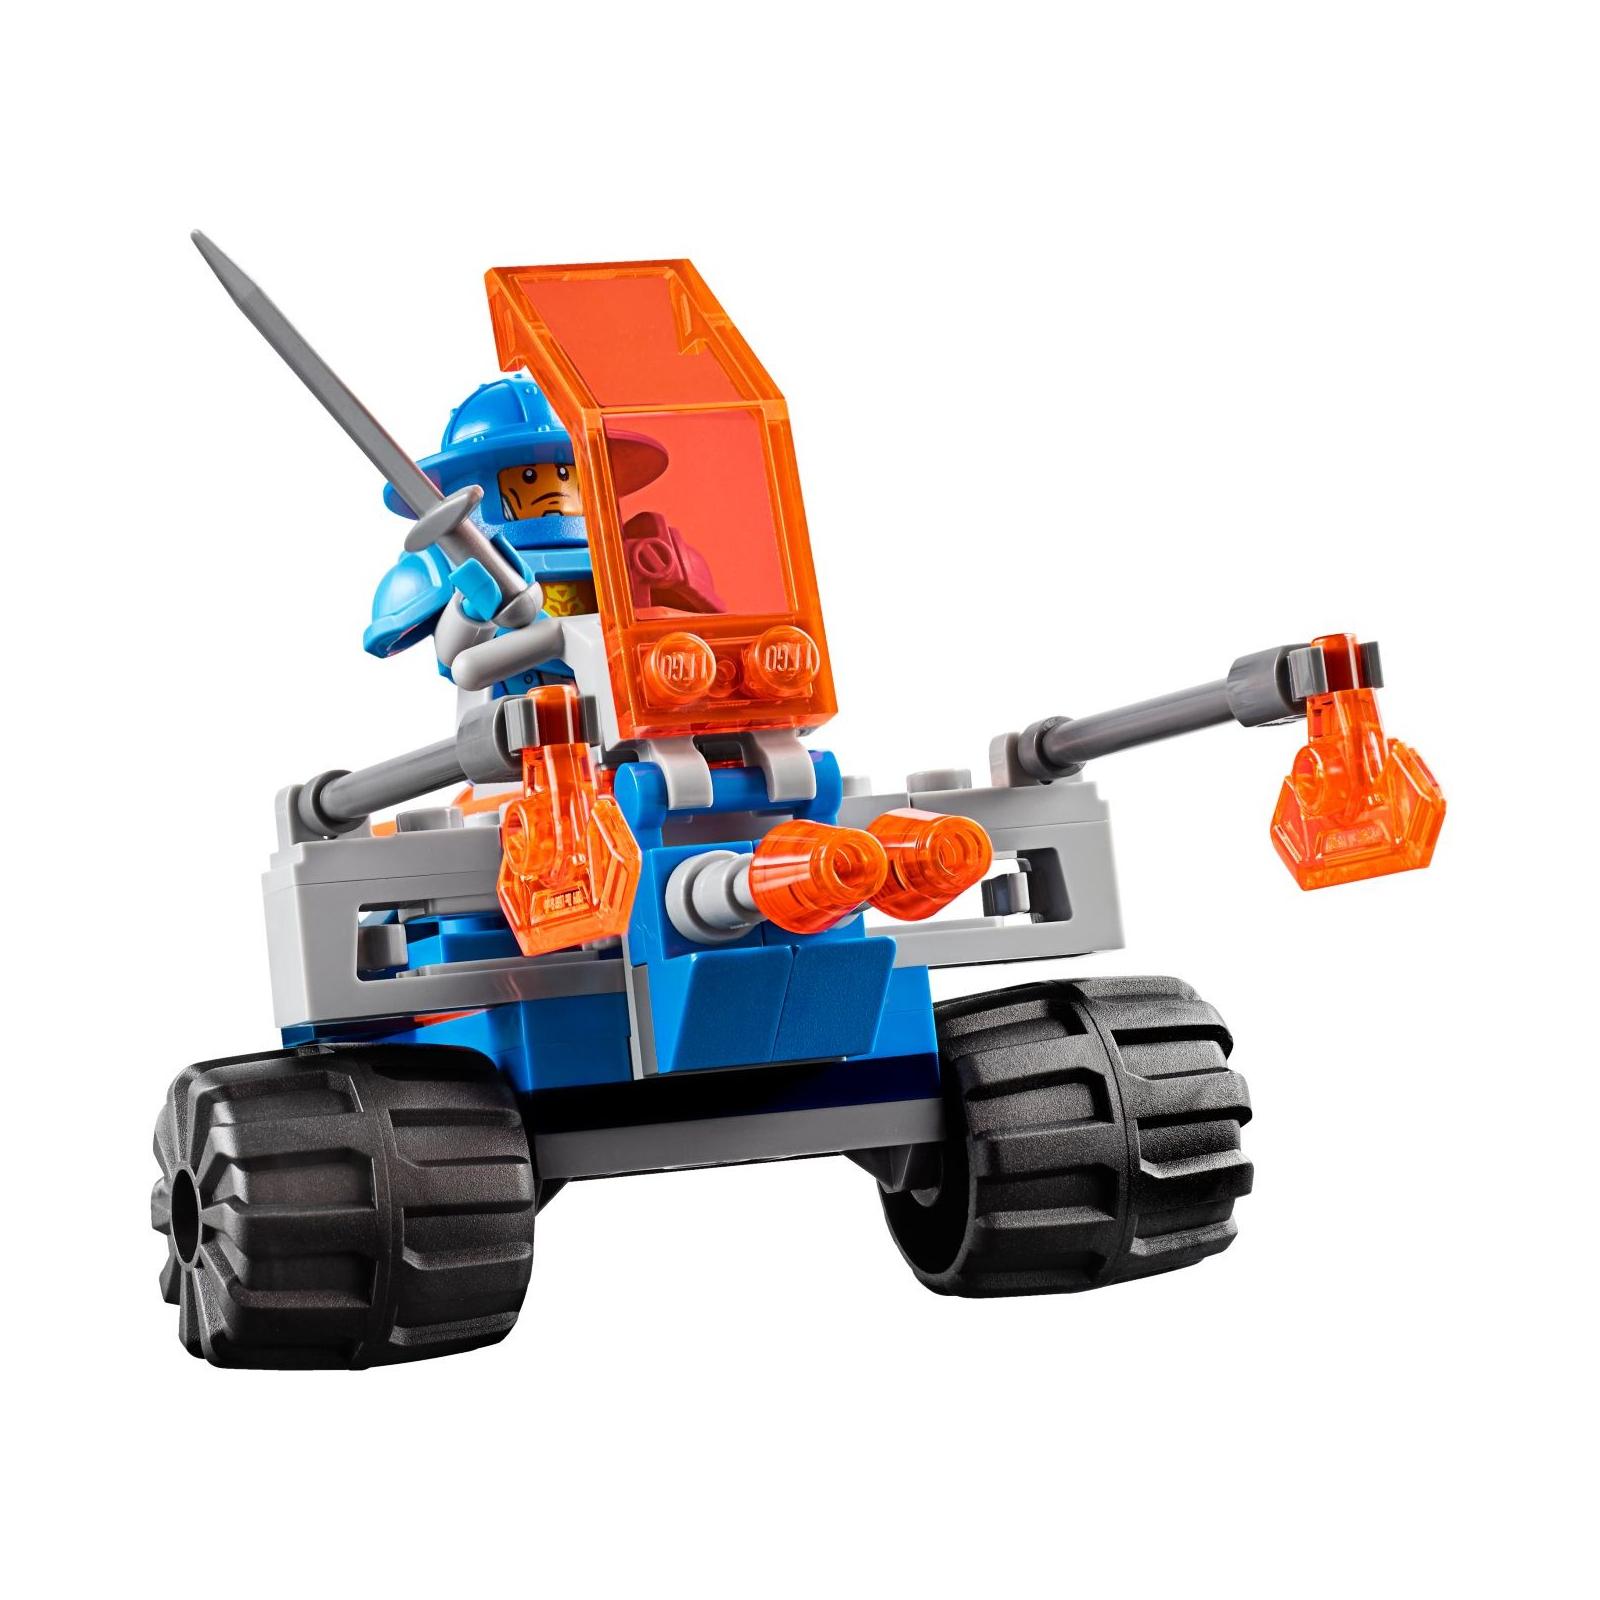 Конструктор LEGO Nexo Knights Королевский боевой бластер (70310) изображение 4